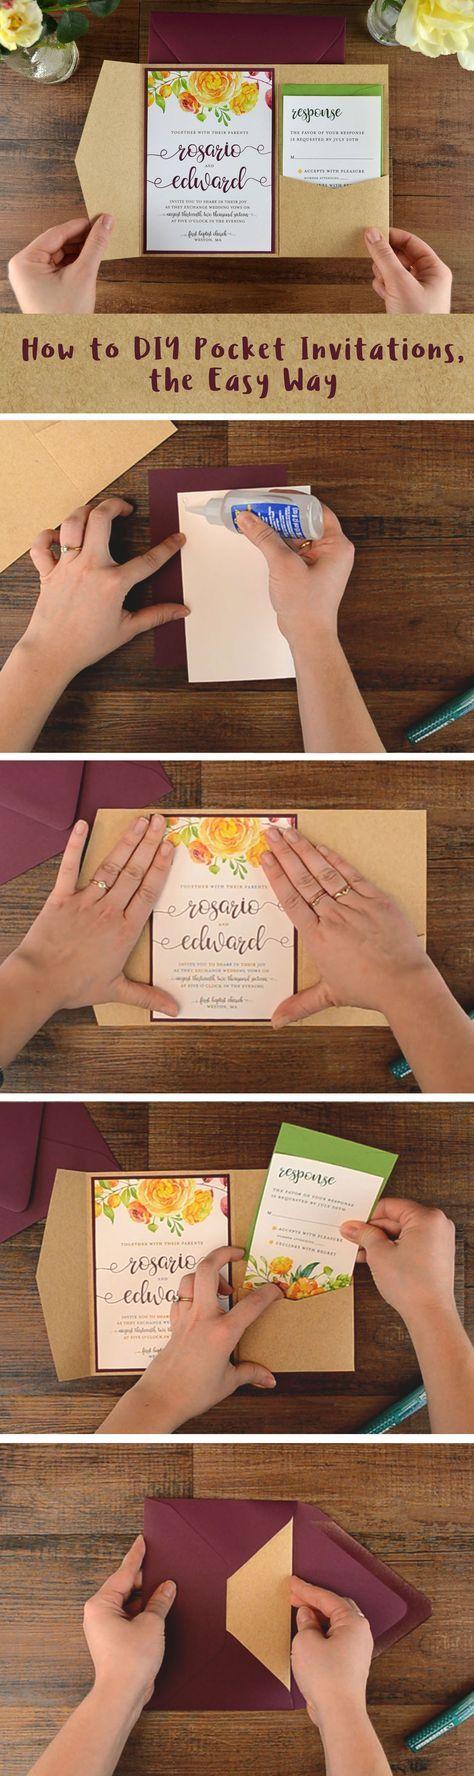 easy diy pocket invitation its easy to create cheap wedding invitations when you diy - Cheap Wedding Invitations Packs